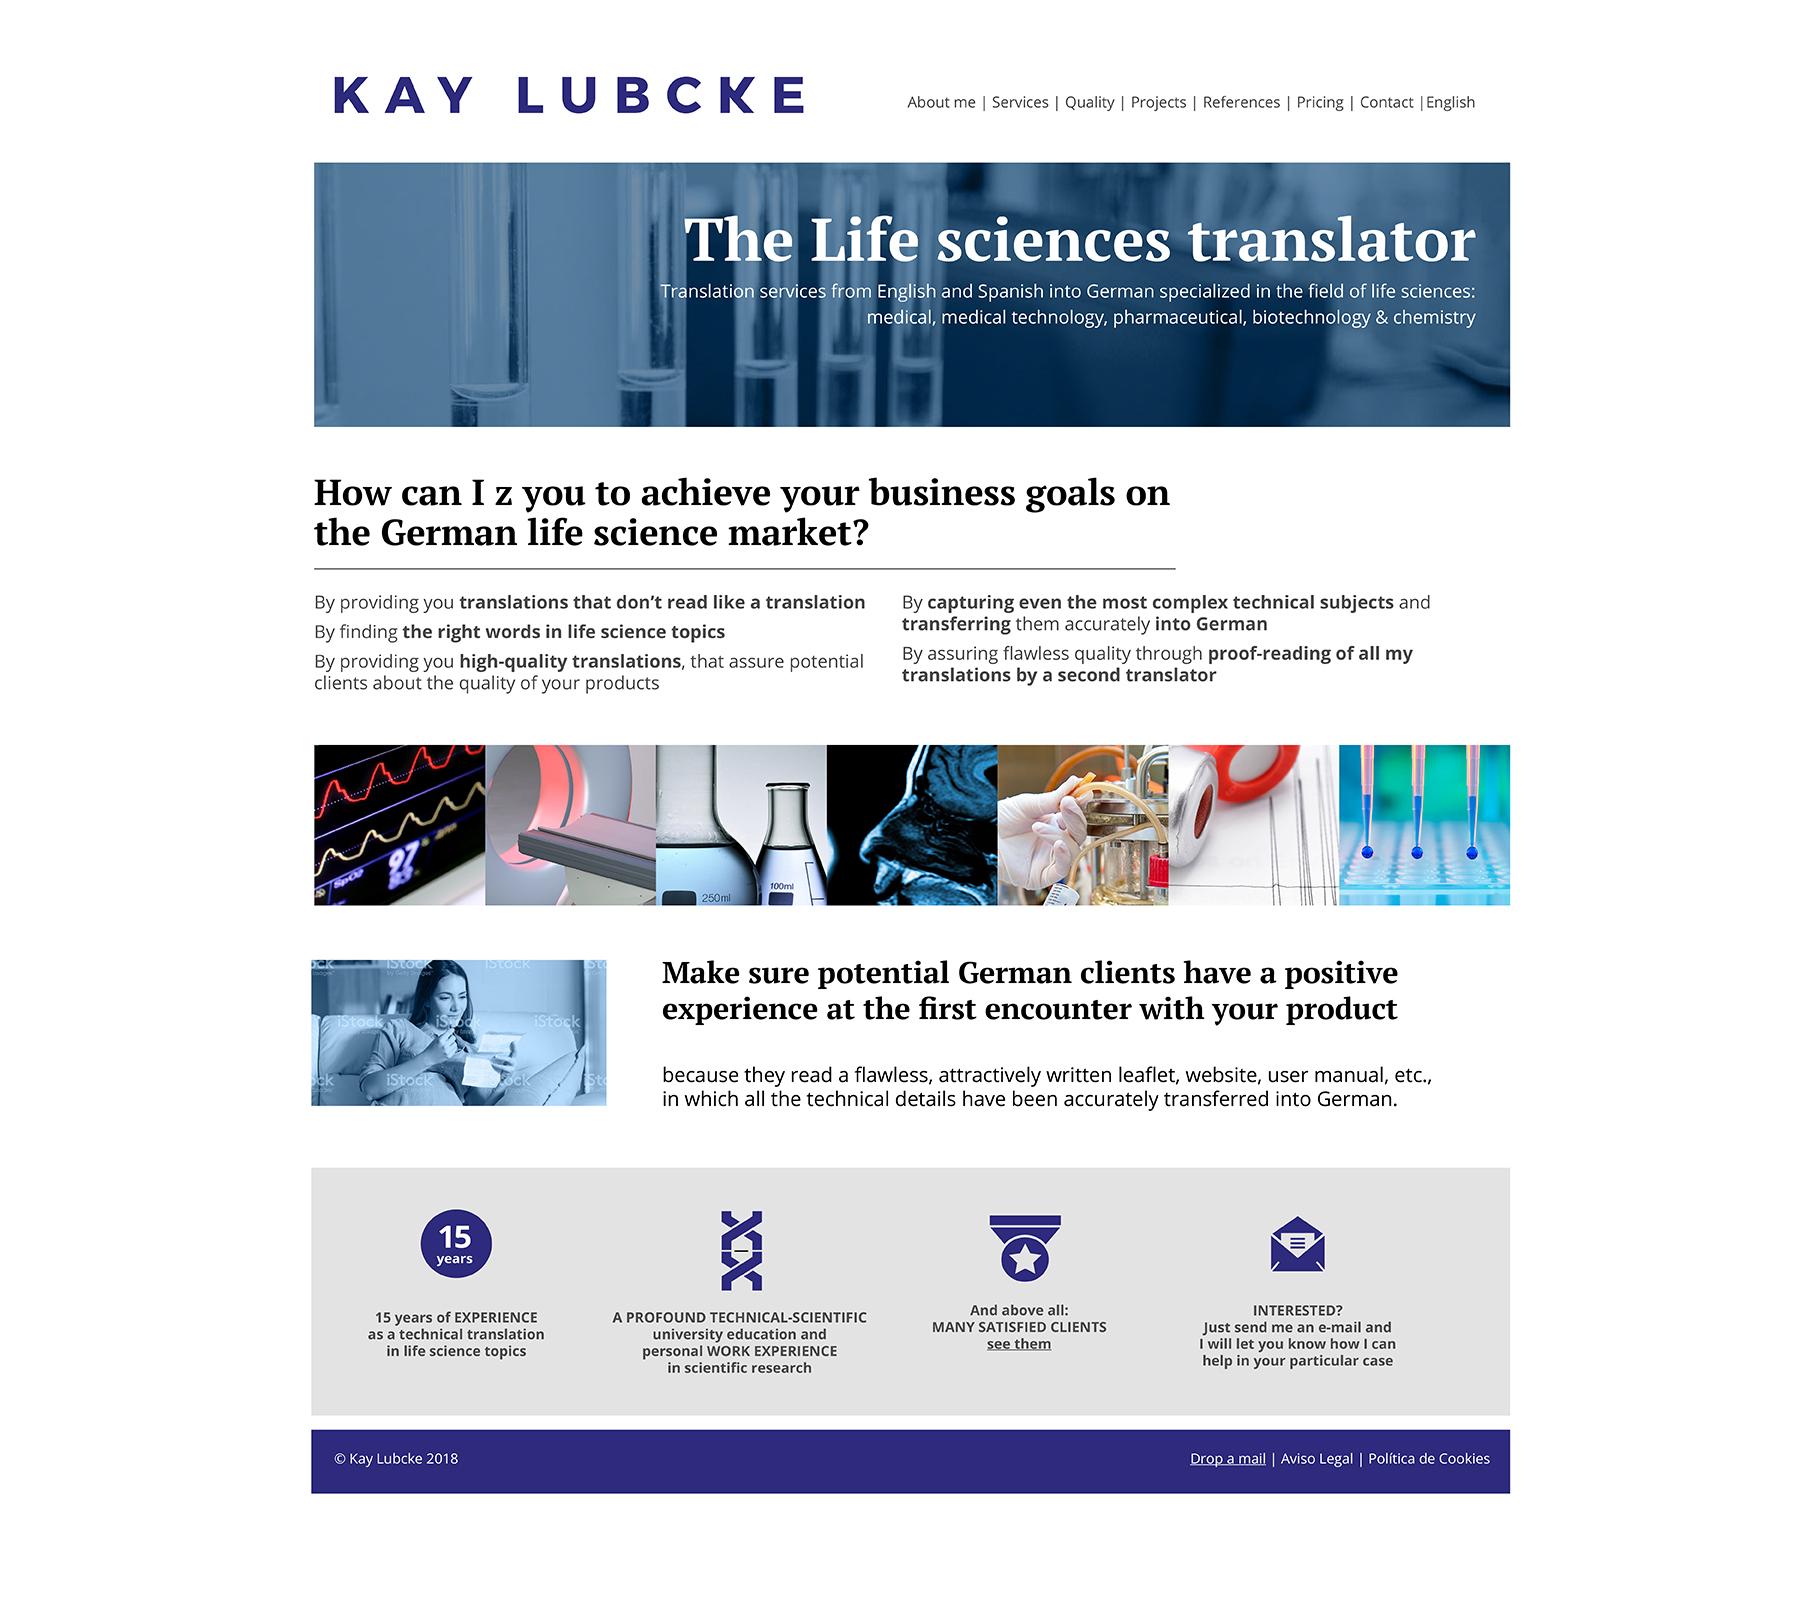 kalubcke_web.jpg